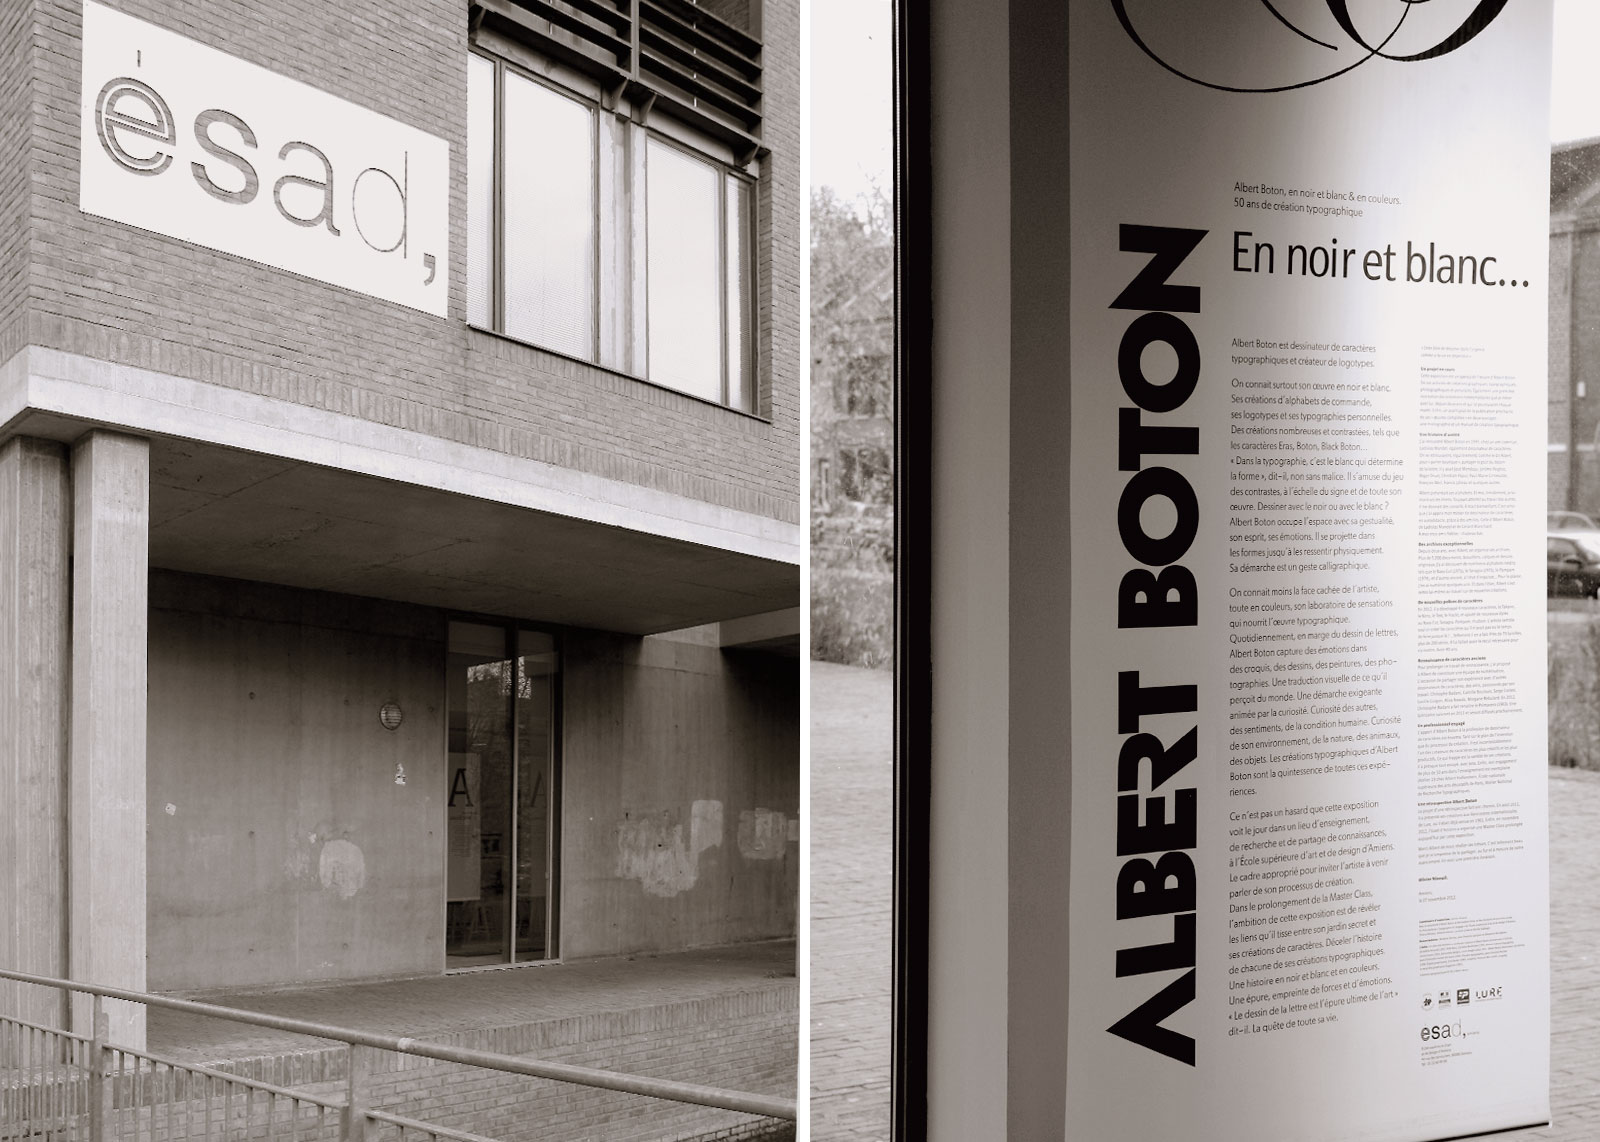 Locaux de l'ESAD d'Amiens, kakemoo de présentation de l'exposition, 26 novembre 2012 (photos Albert Boton).